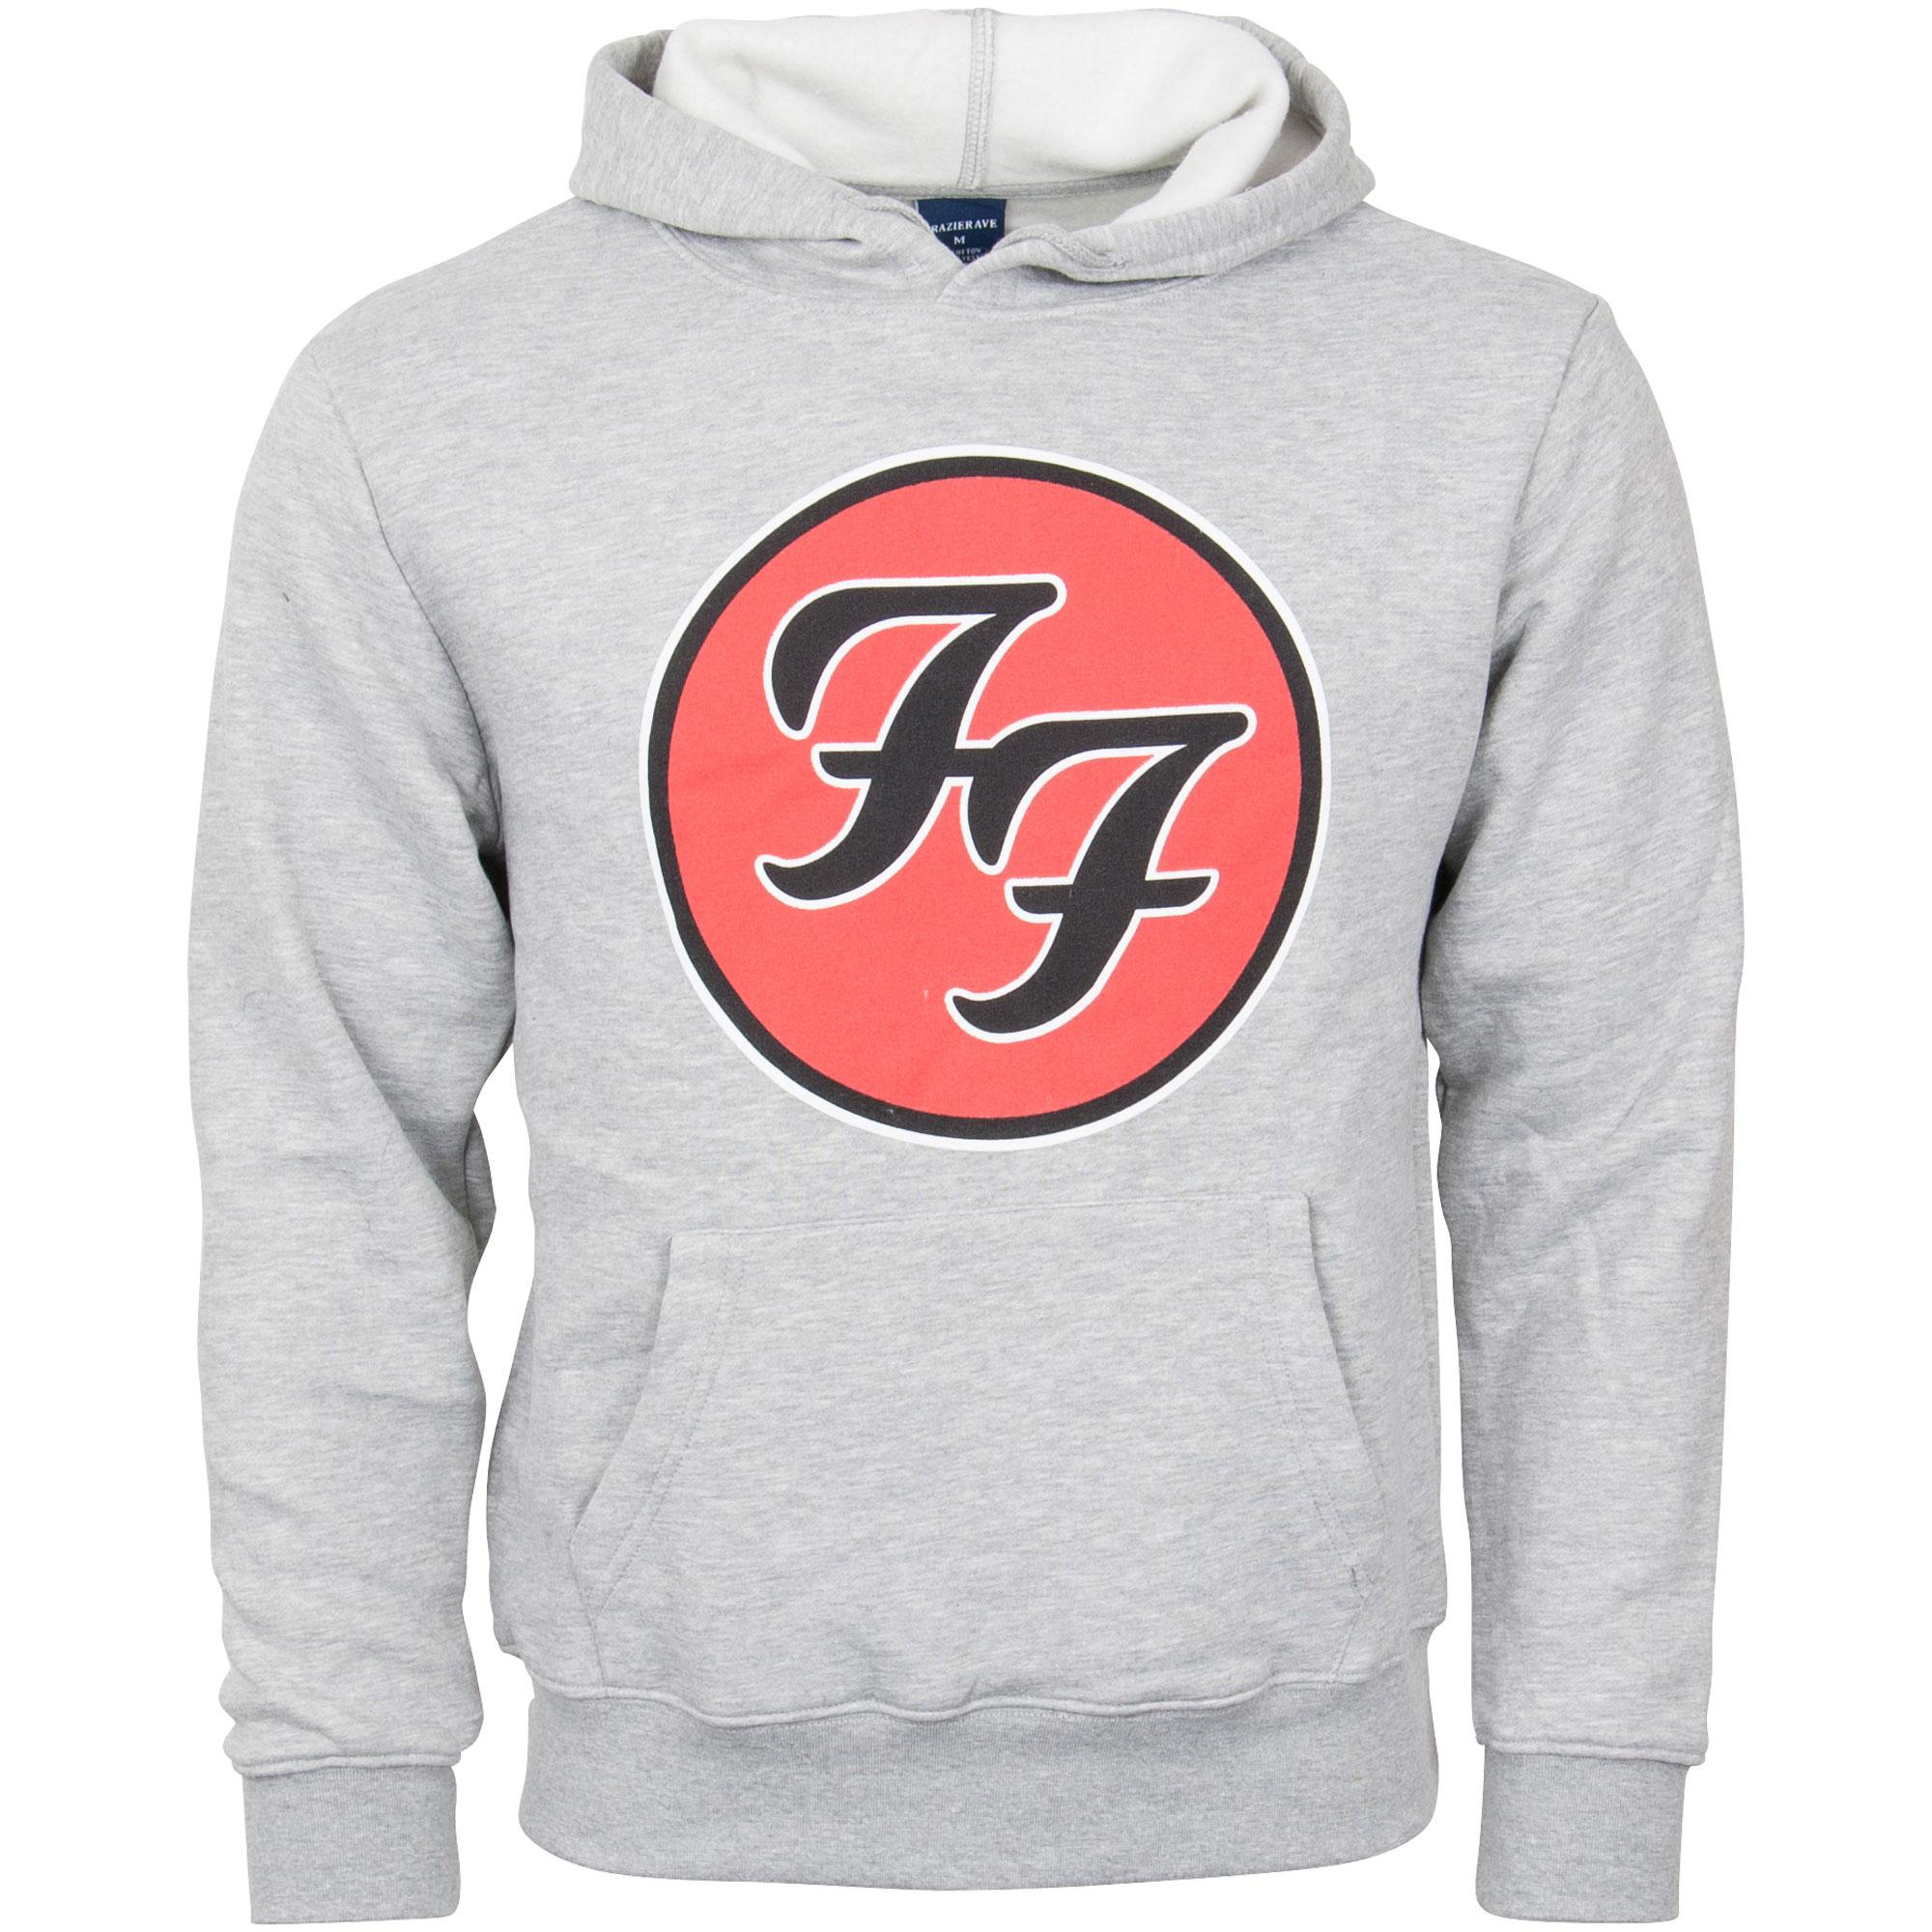 Foo Fighters - Kapuzenpullover Logo - grau